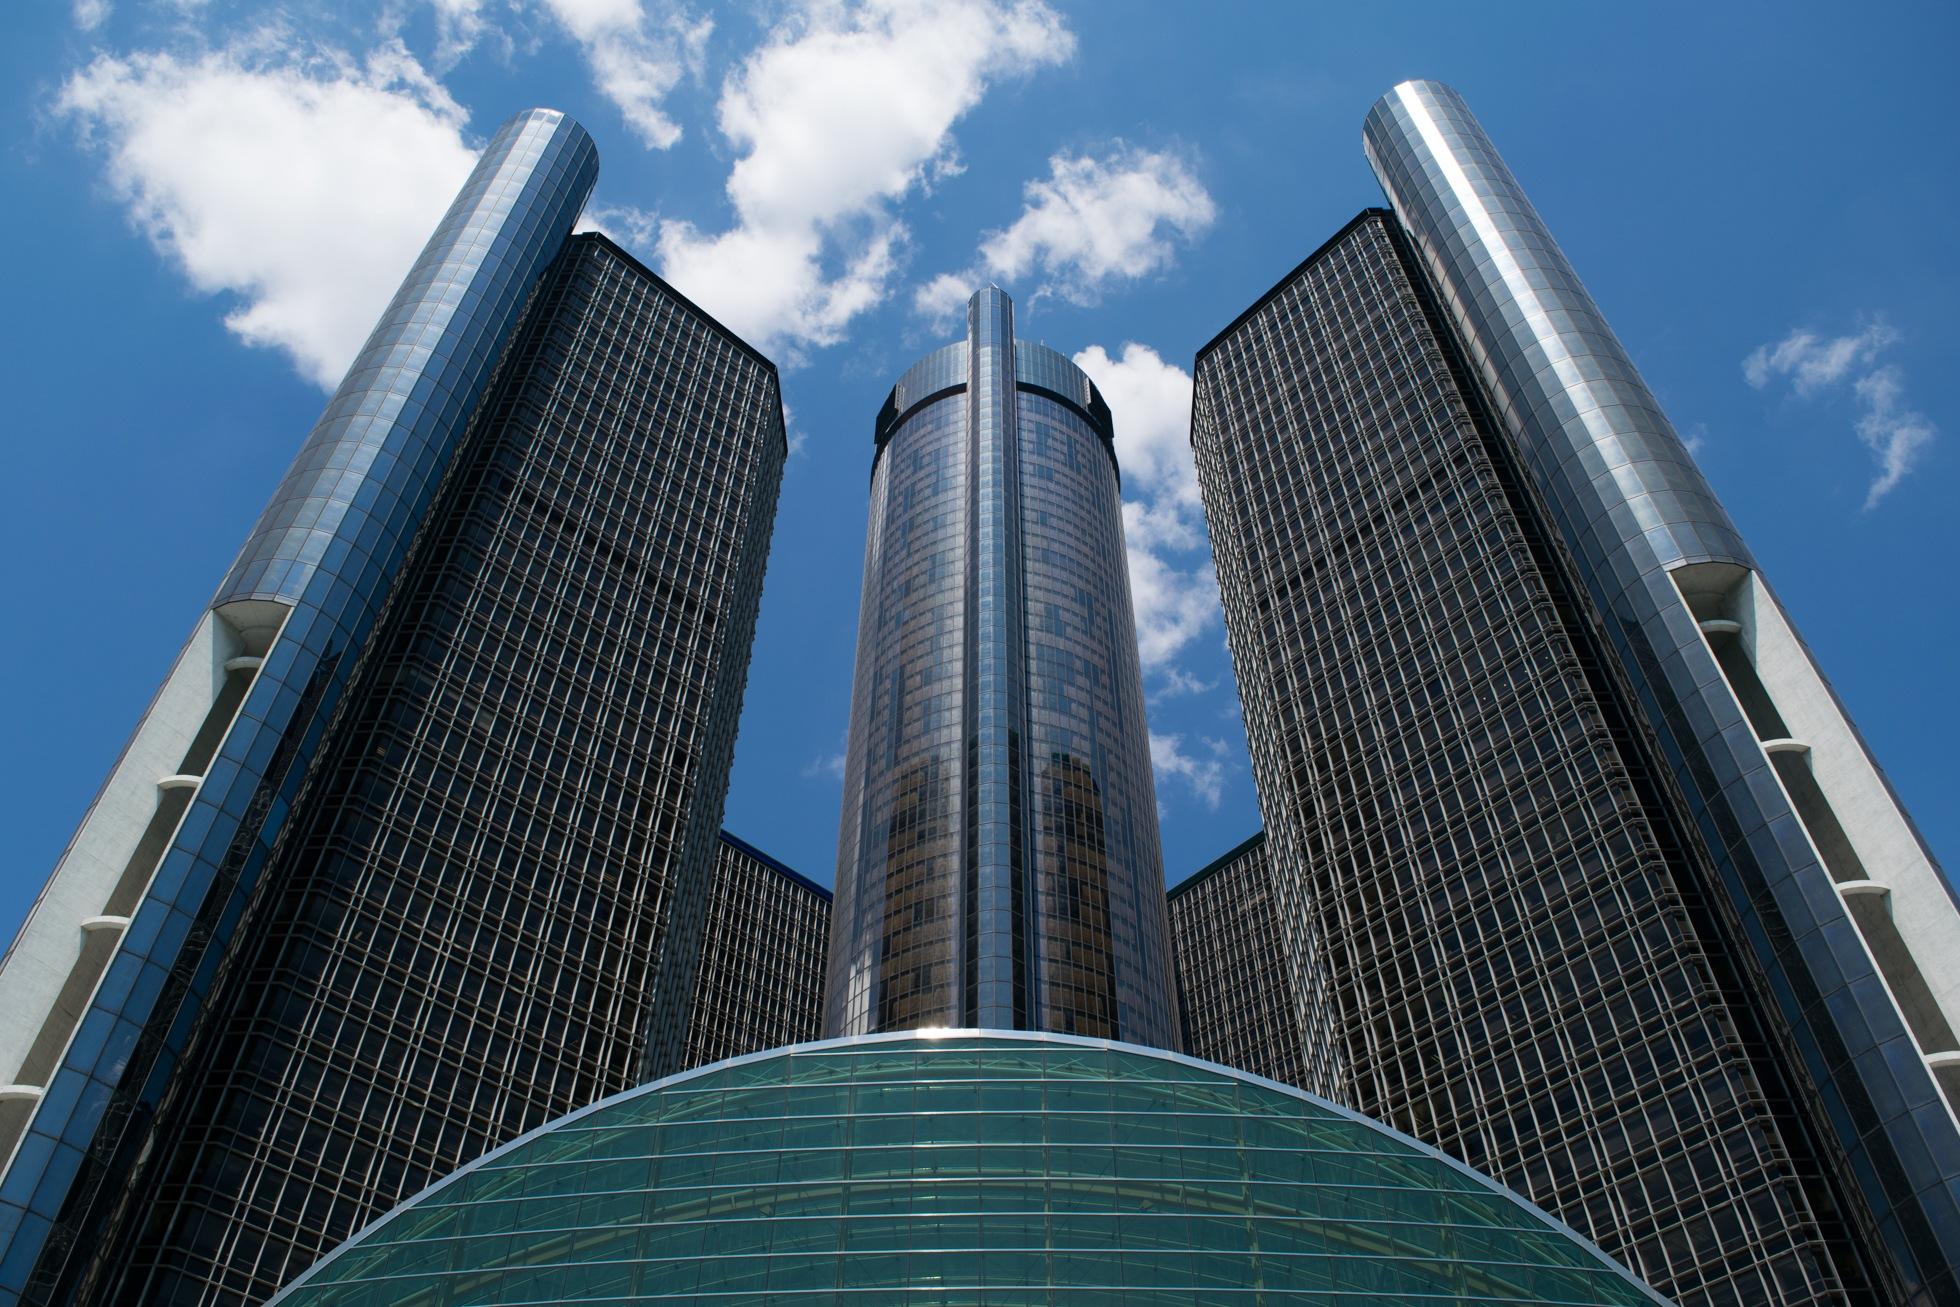 General Motors Rennaissance Center by WesShealey